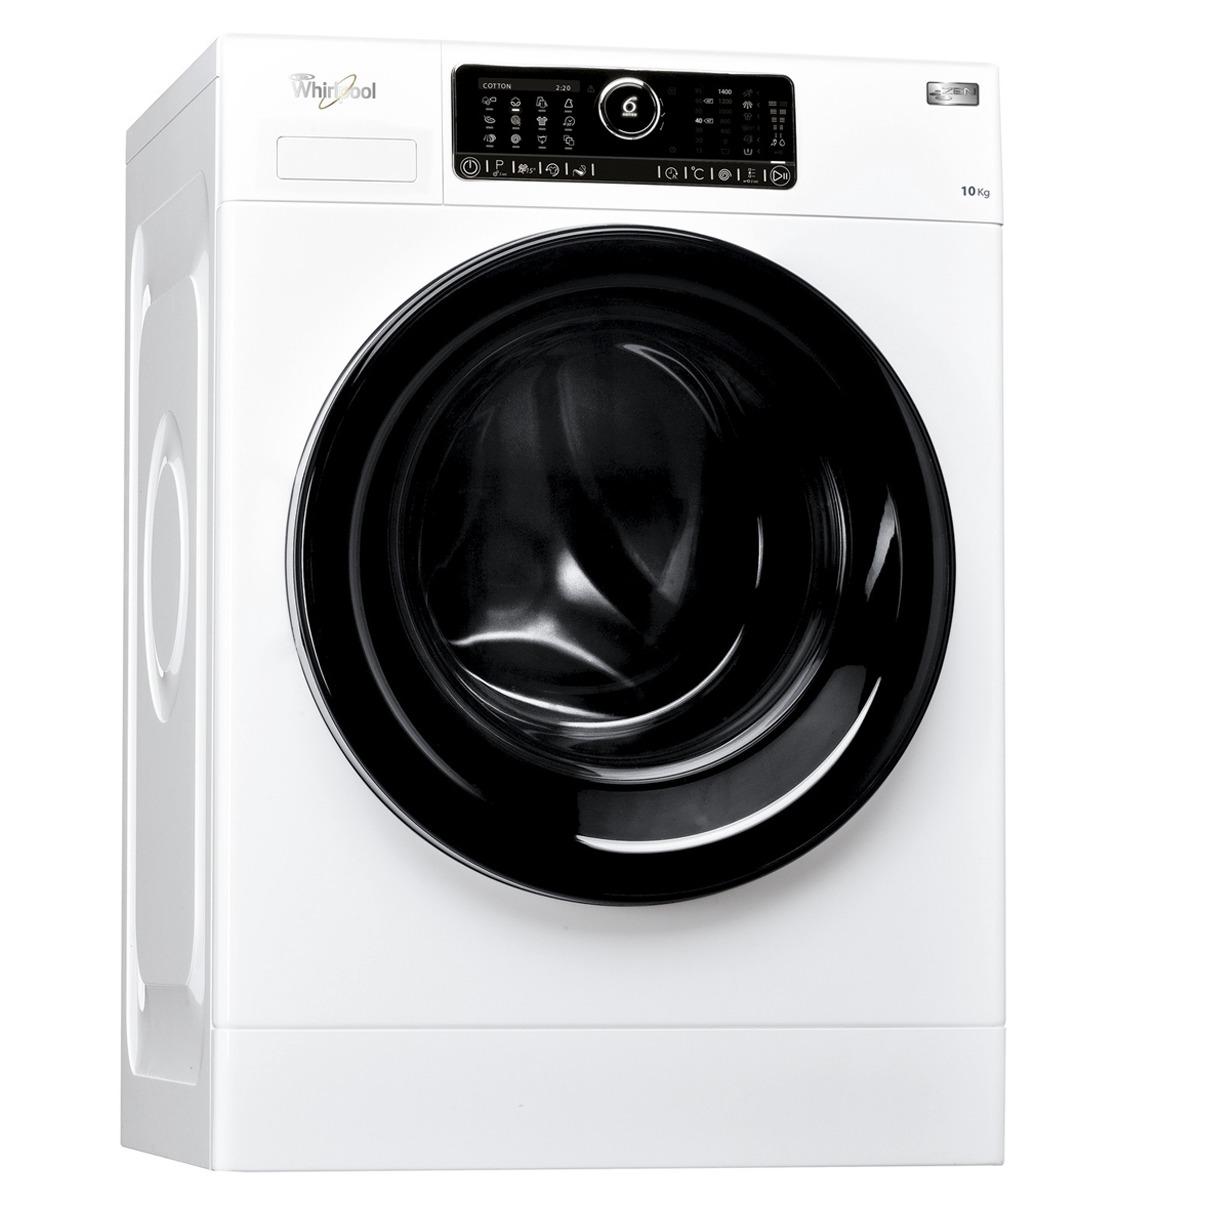 Whirlpool voorlader FSCR10430